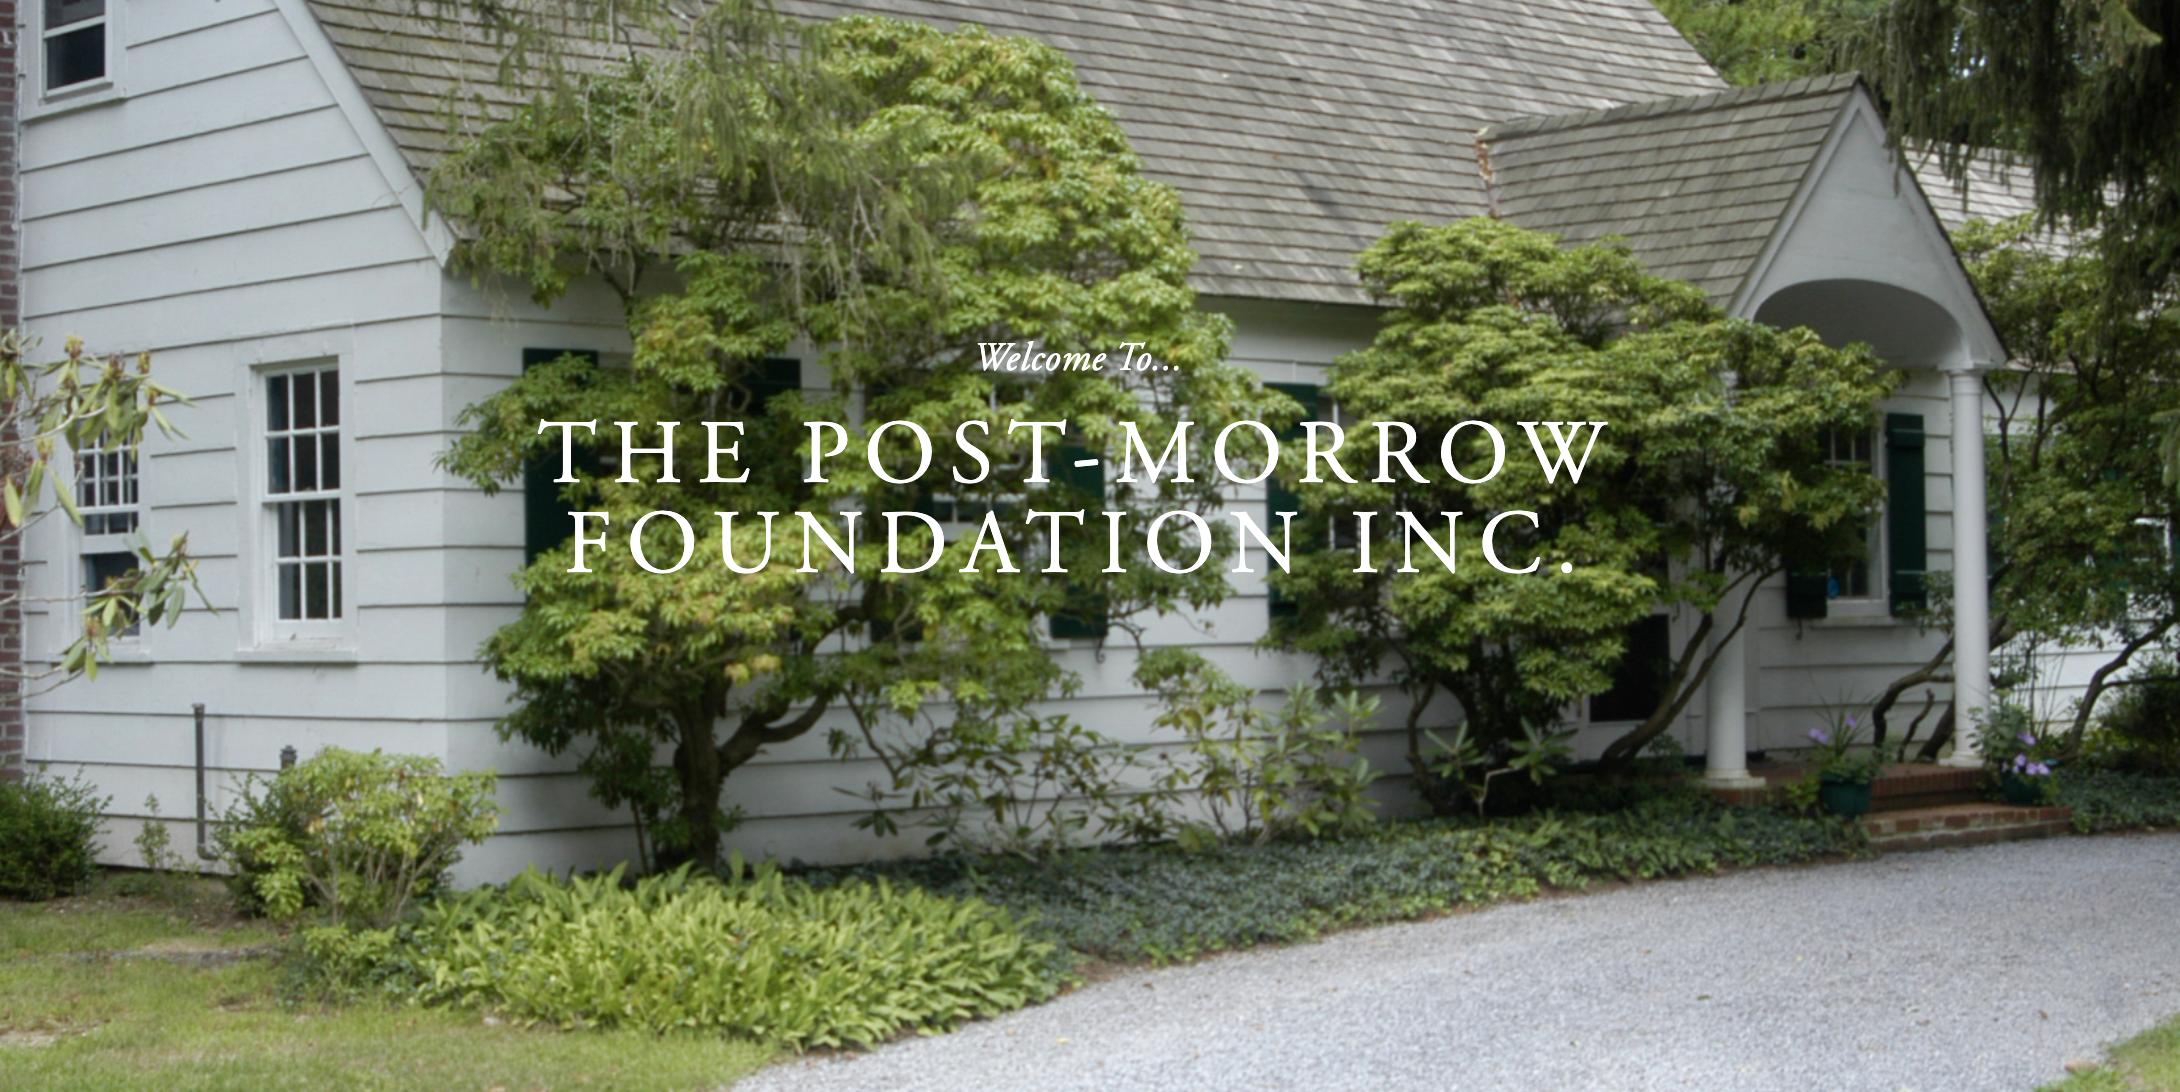 Post Morrow Foundation